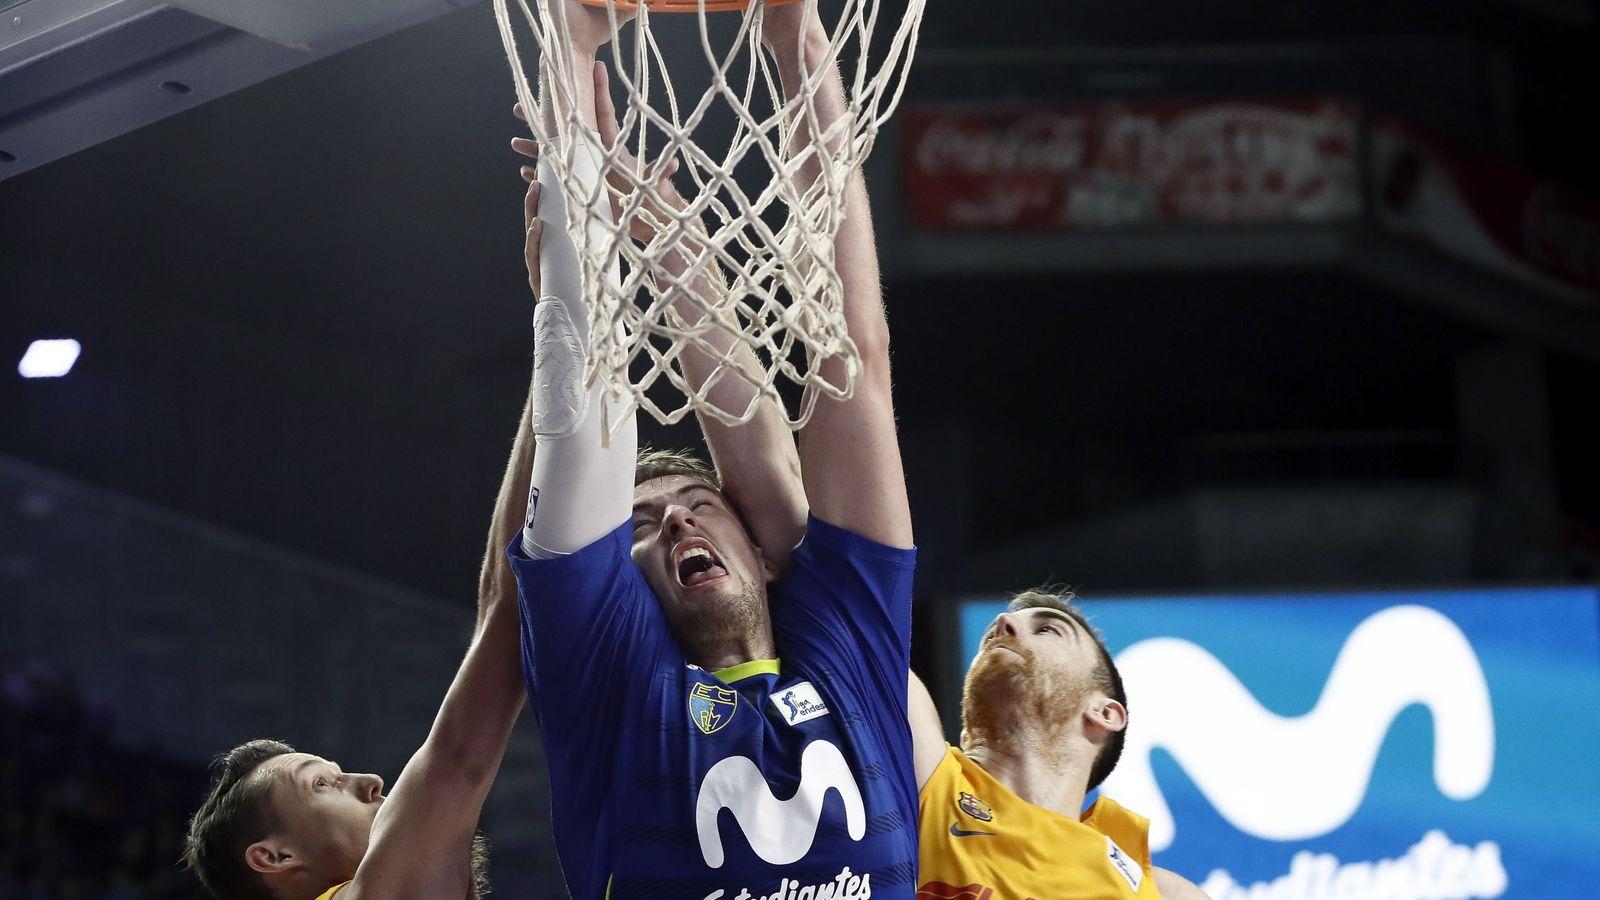 Foto: Ondrej Balvin anotó los dos tiros libres que forzaron la prórroga en el Estudiantes-Barcelona (Mariscal/EFE)